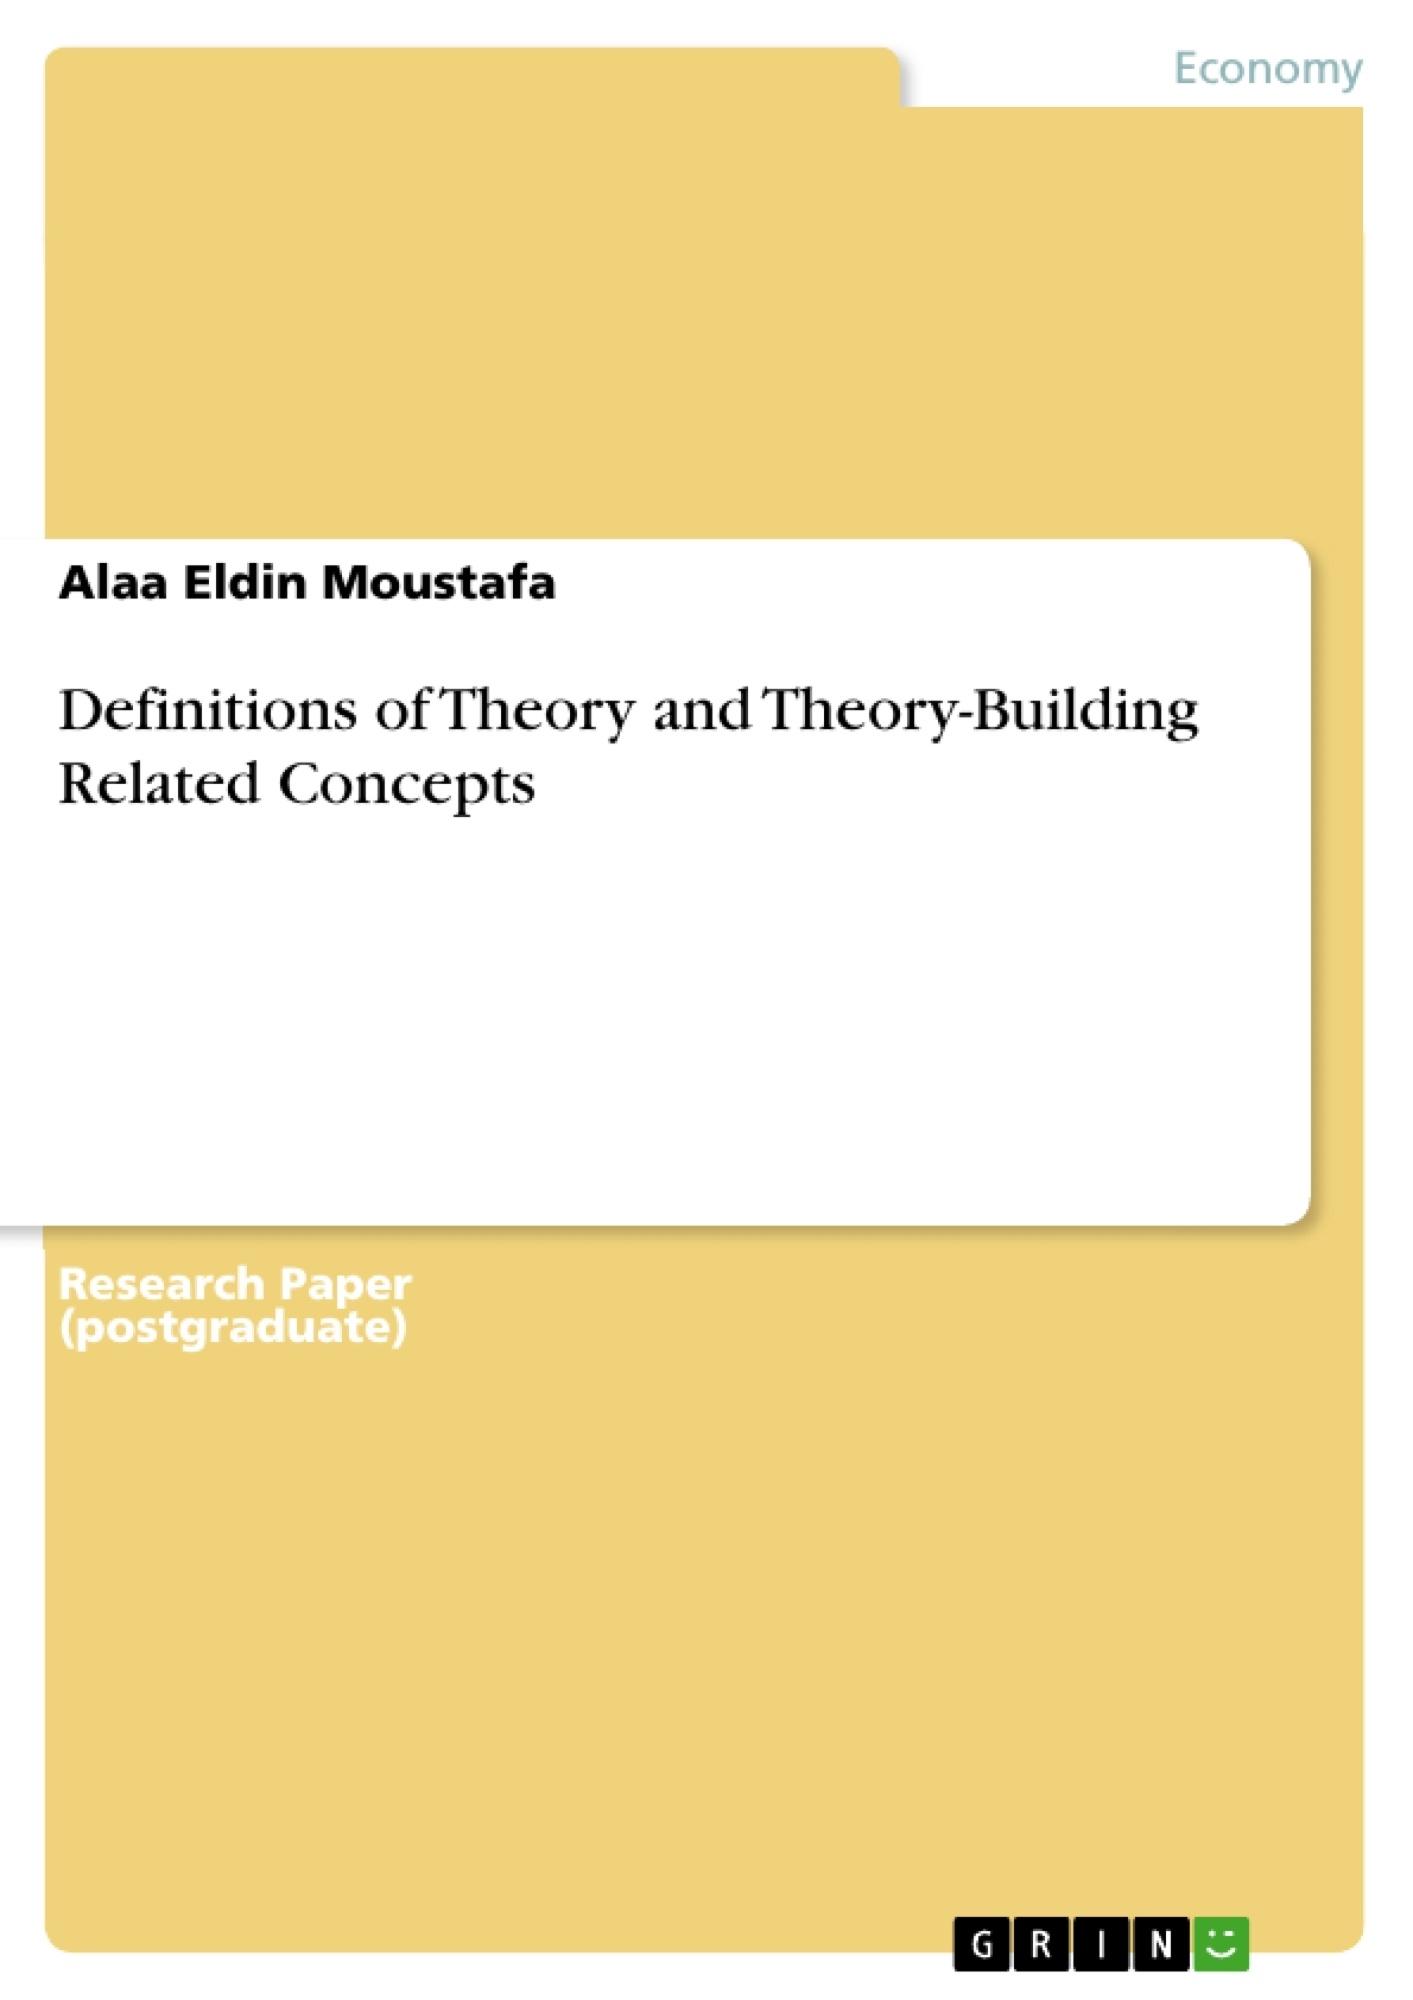 teacher research paper modeling